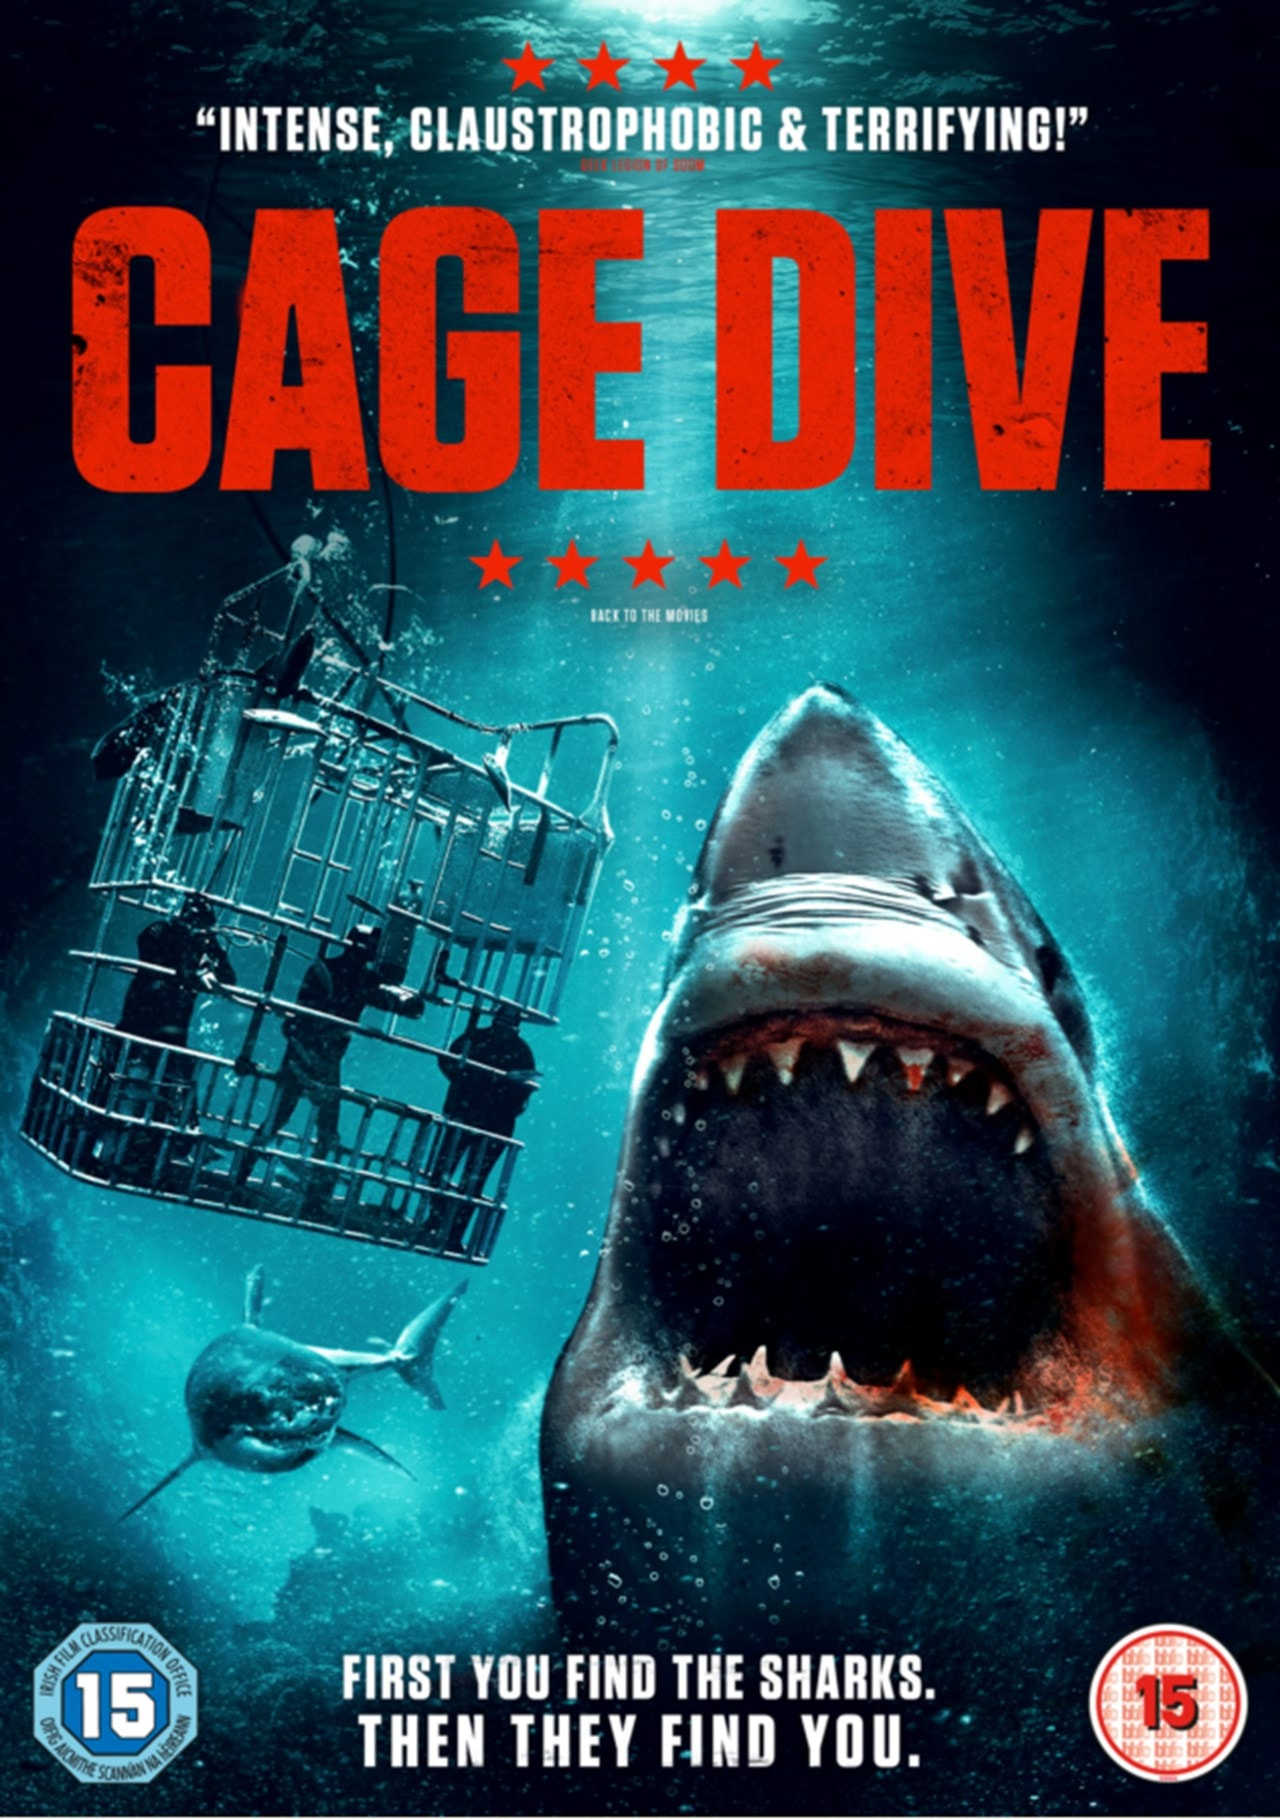 Cage Dive - 1